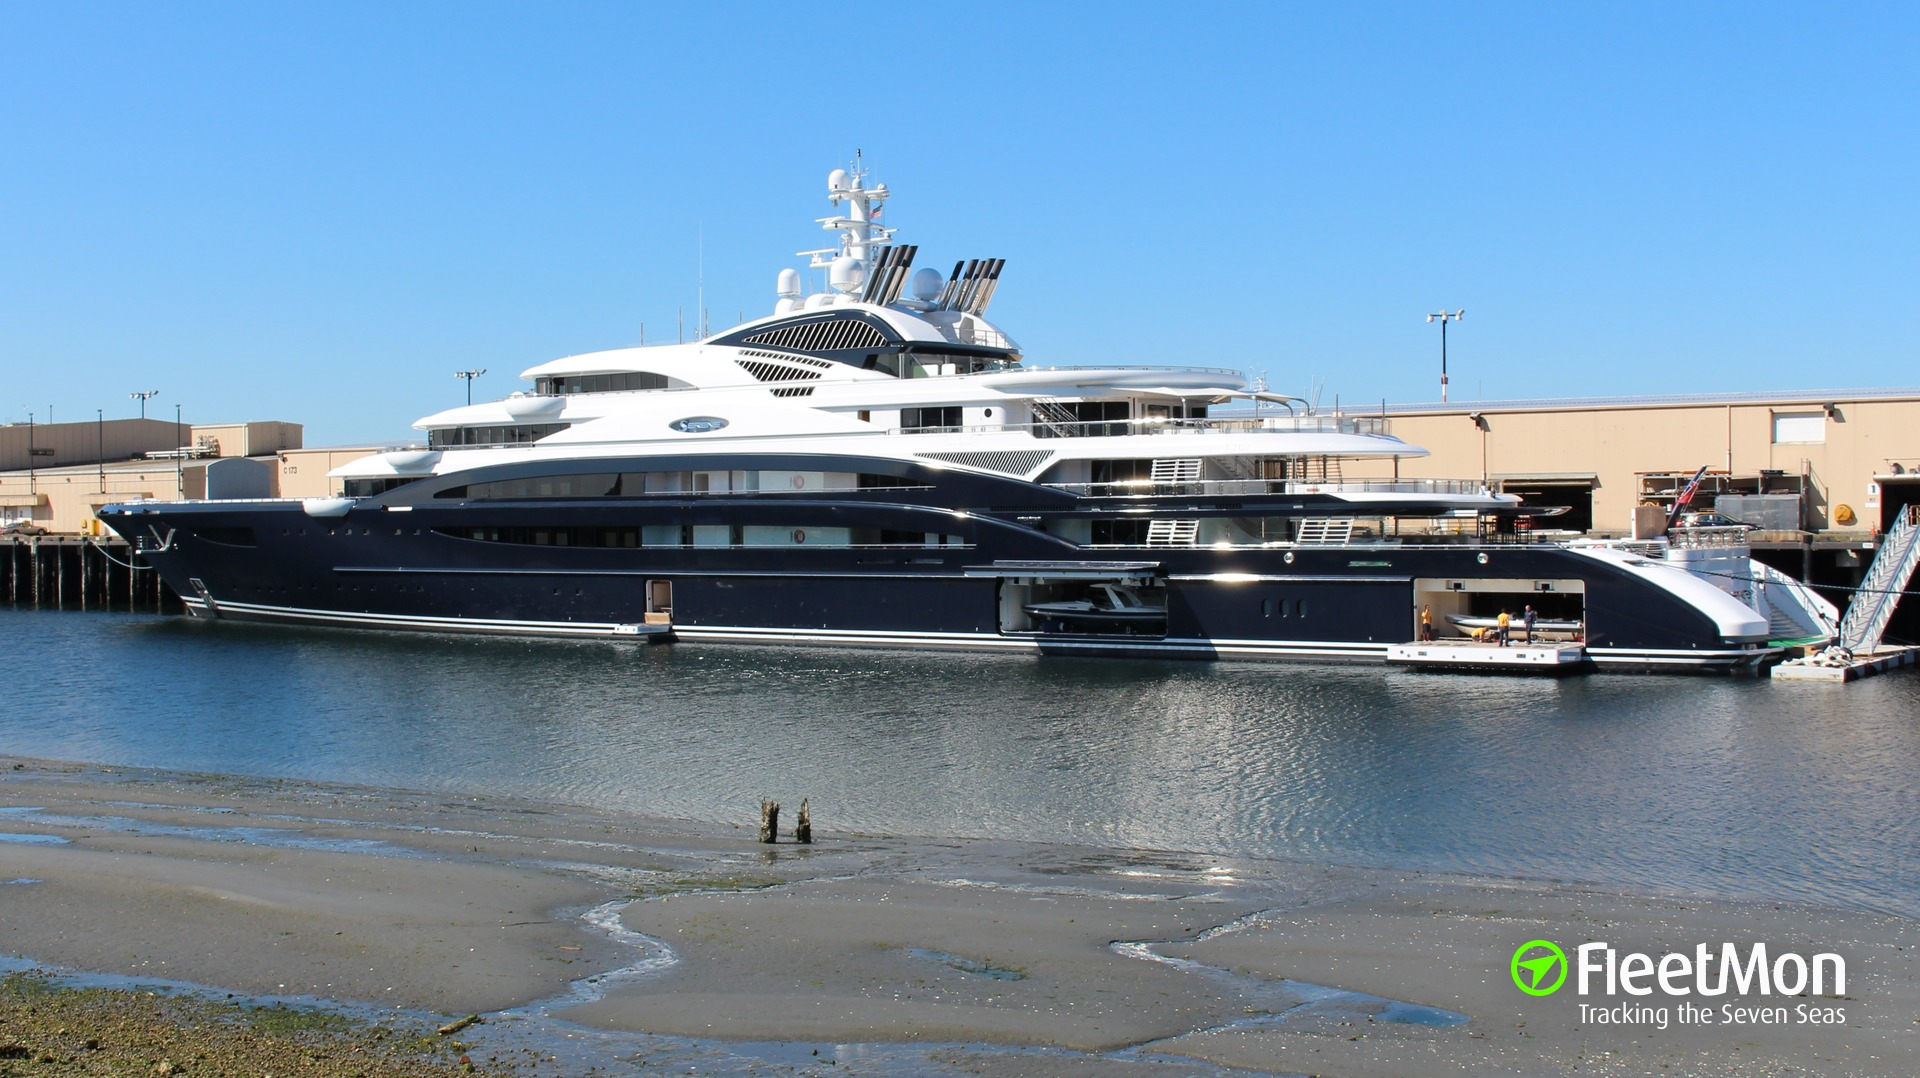 Vessel Serene Yacht Imo 1010090 Mmsi 319021900